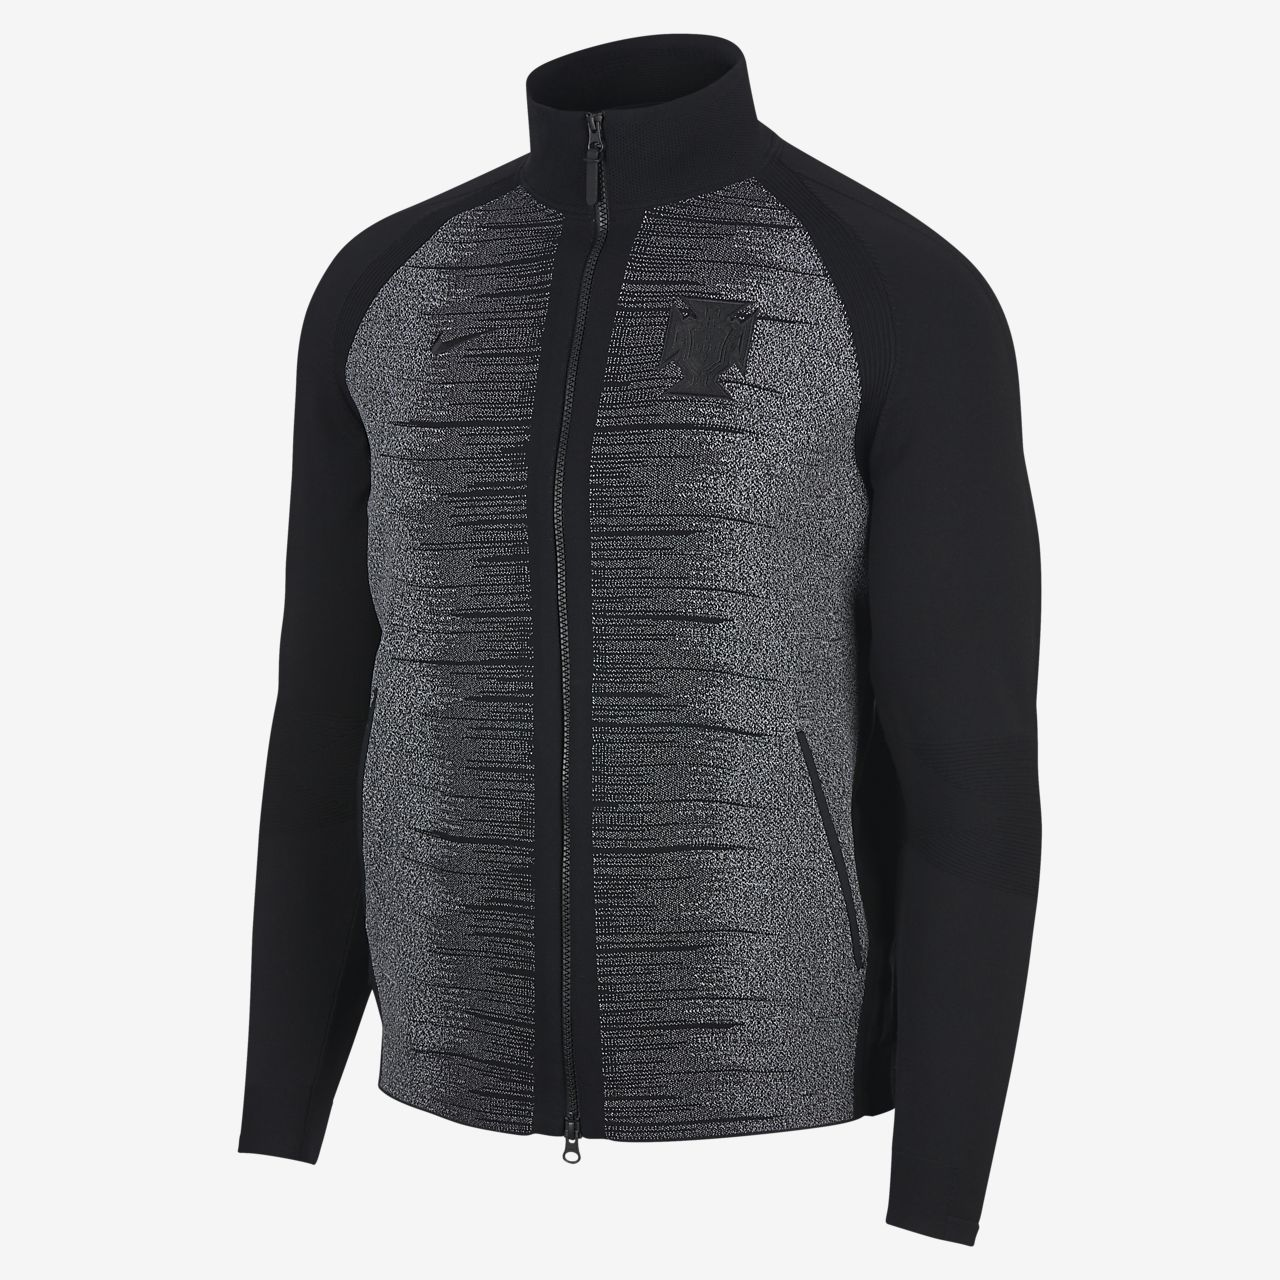 Portugal Tech Knit Men's Jacket